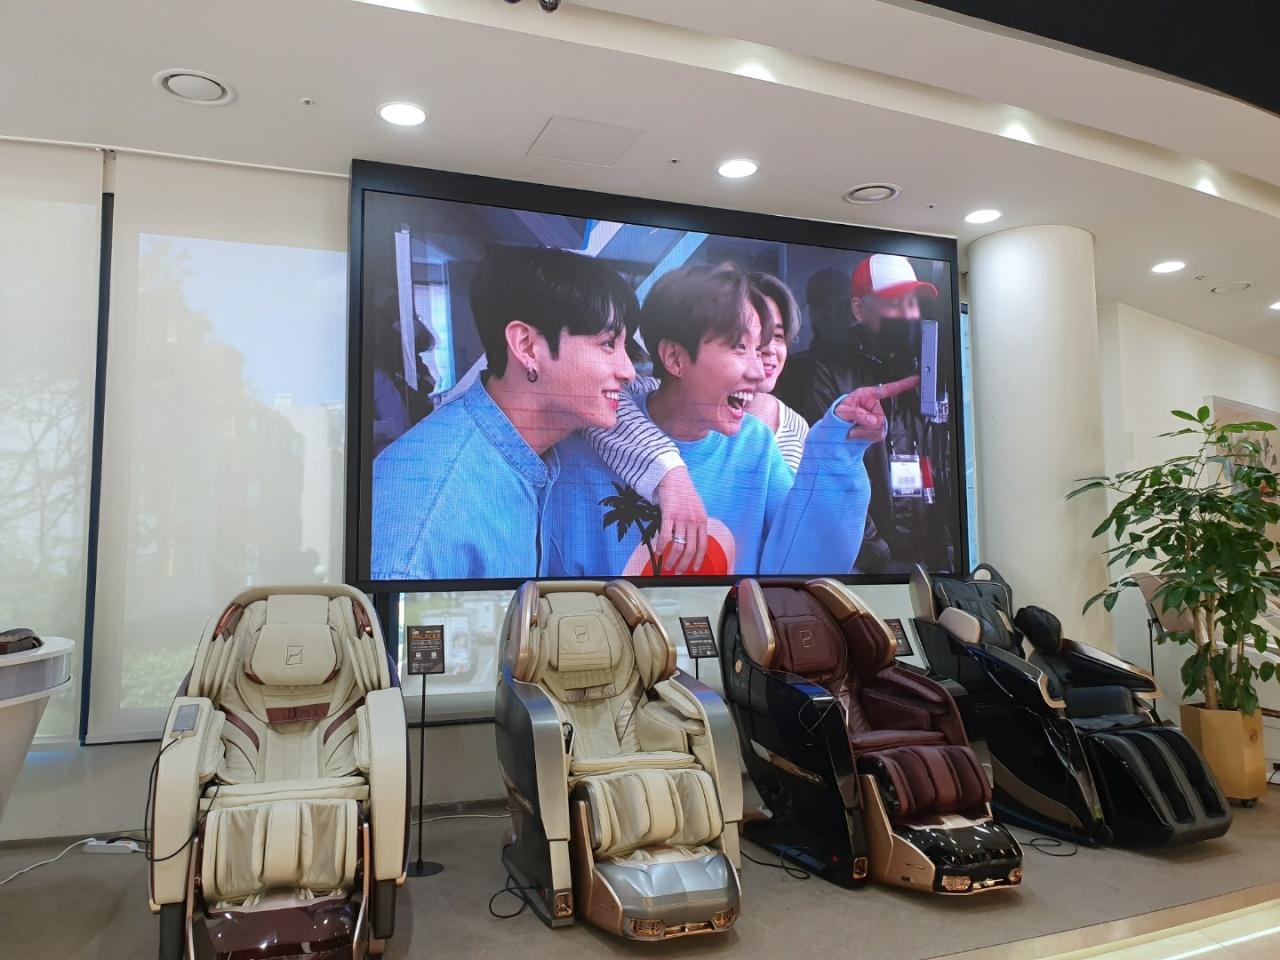 Bodyfriend's headquarters (The Korea Herald)